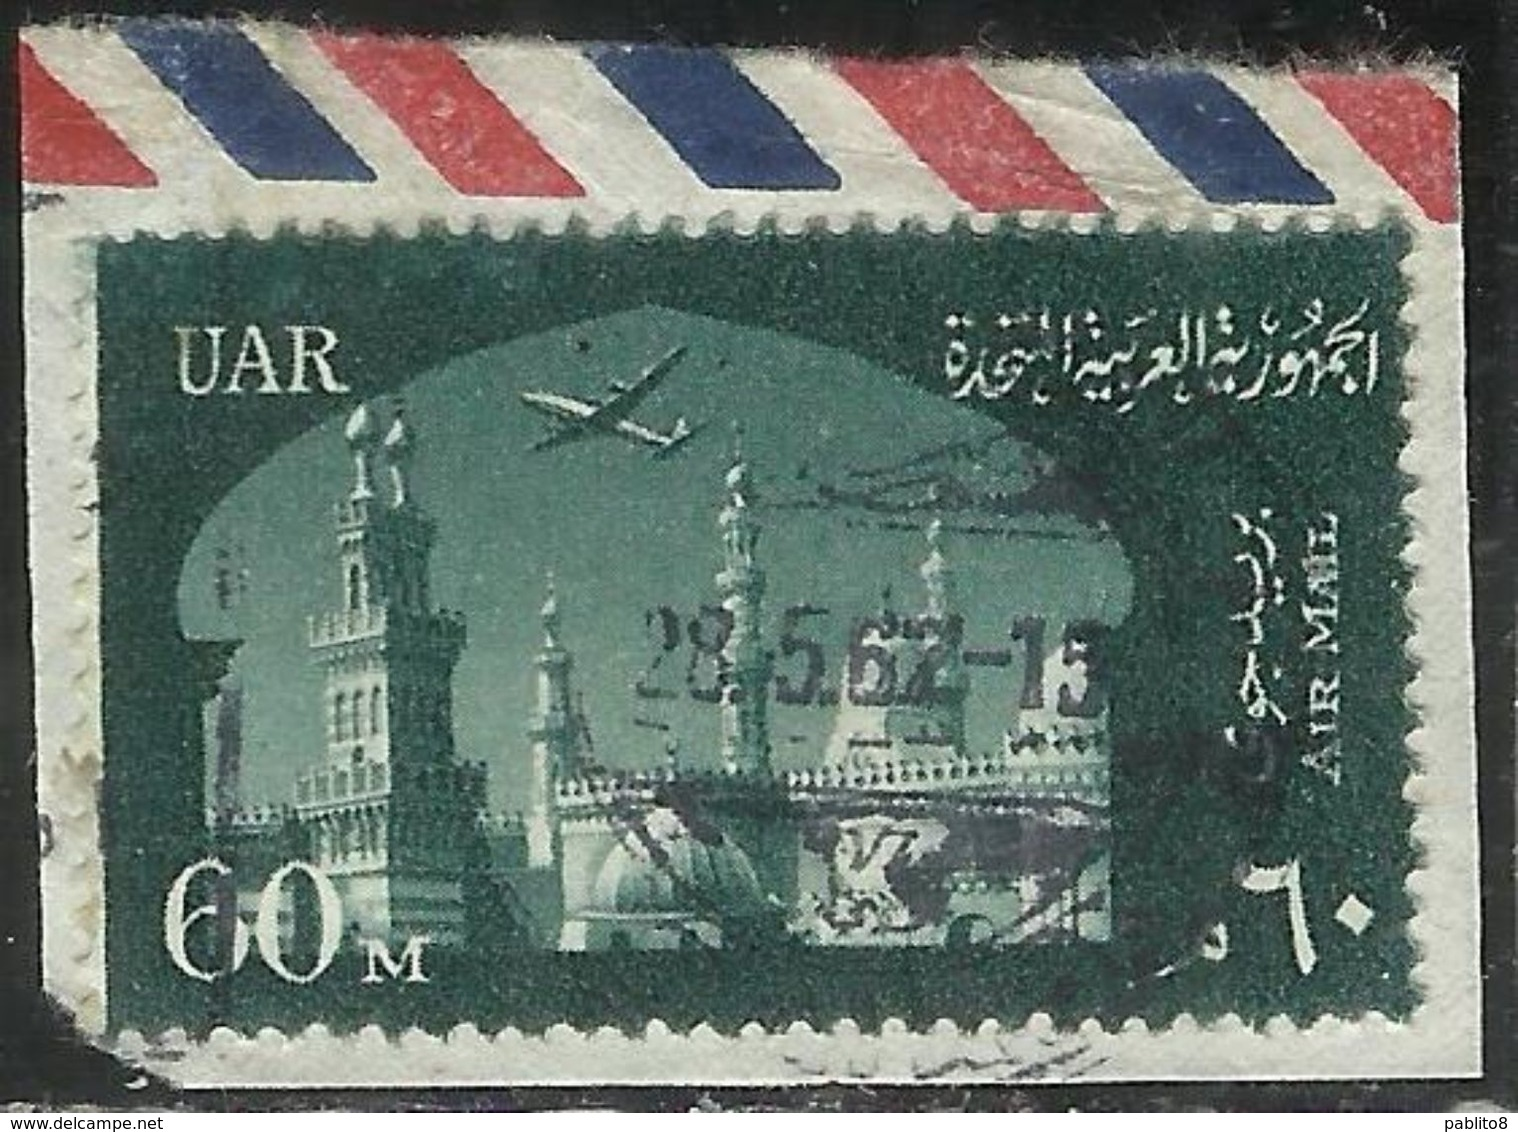 UAR EGYPT EGITTO 1958 AIR MAIL POSTA AEREA AL AZHAR UNIVERSITY UNIVERSITA' 60m USATO USED OBLITERE' - Poste Aérienne